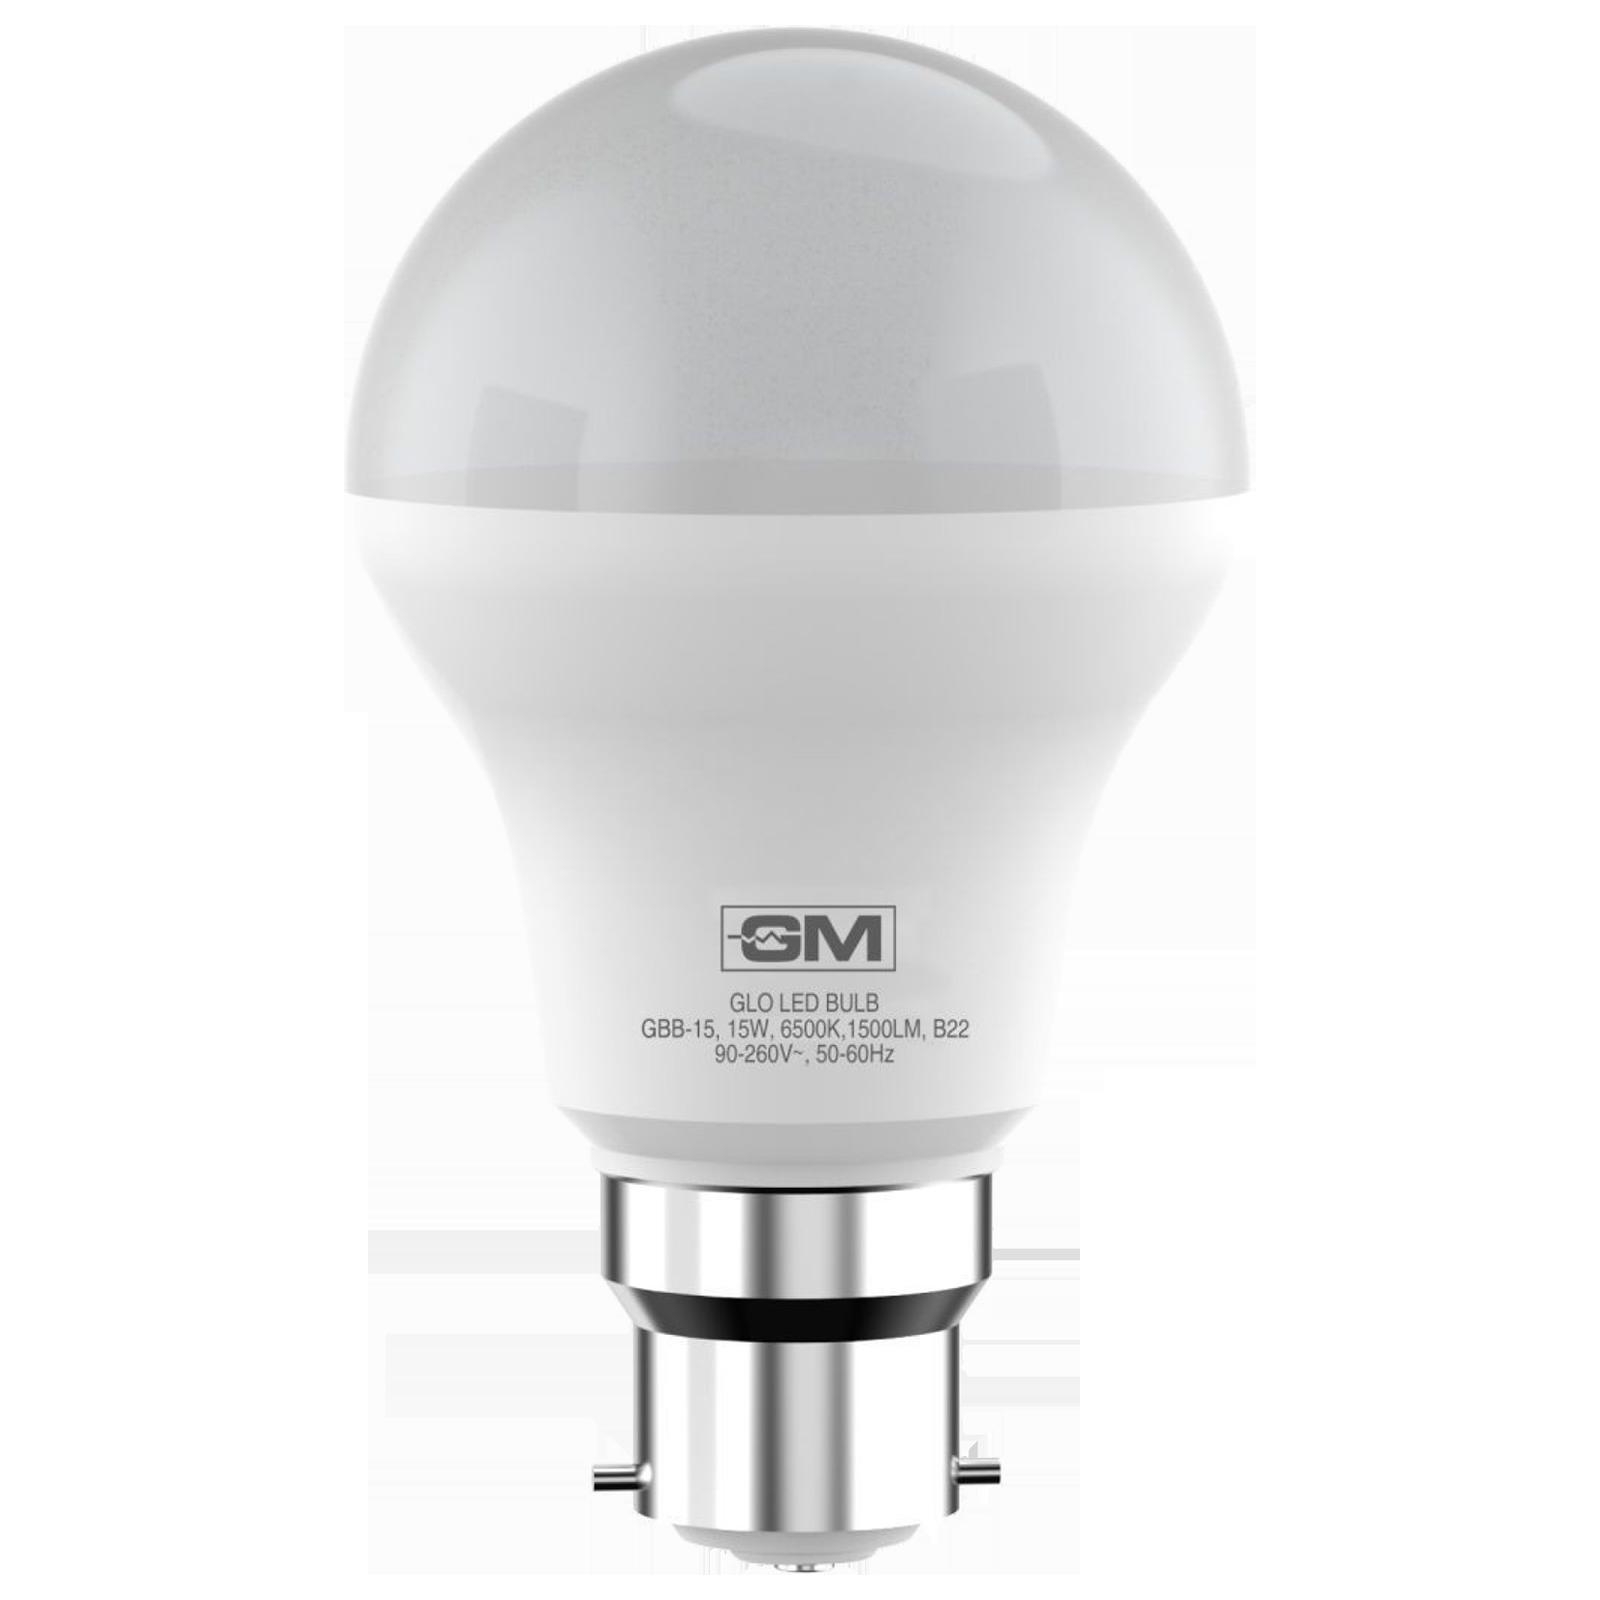 GM GLO 15 Watts Electric Powered LED Bulb (1500 Lumens, GBB-15-6.5K-6500K, White)_1